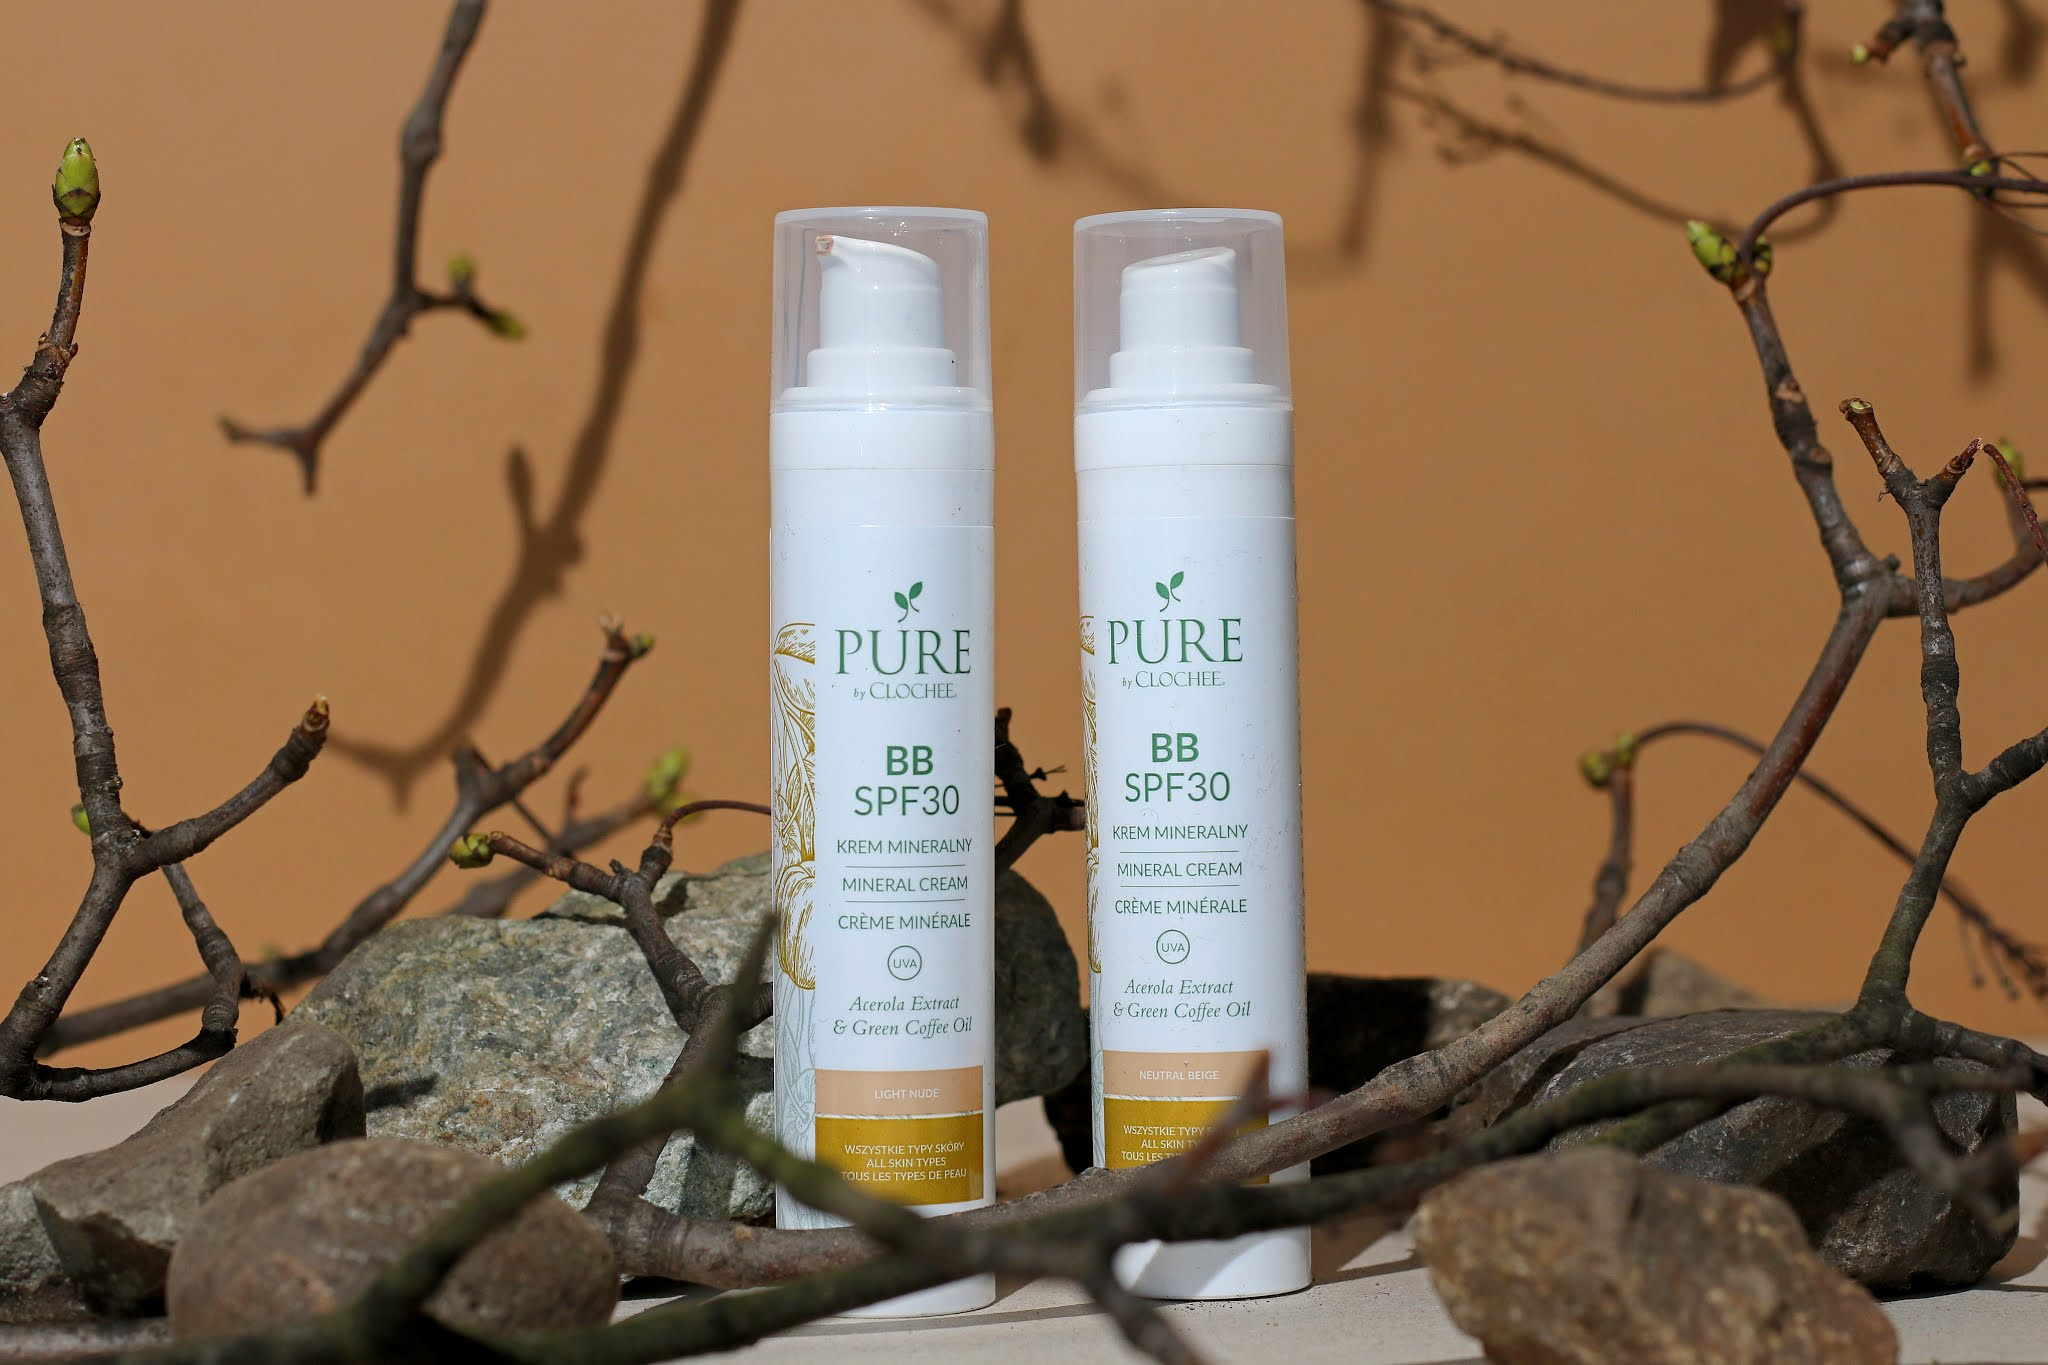 Pure By Clochee - Mineralny krem BB SPF30